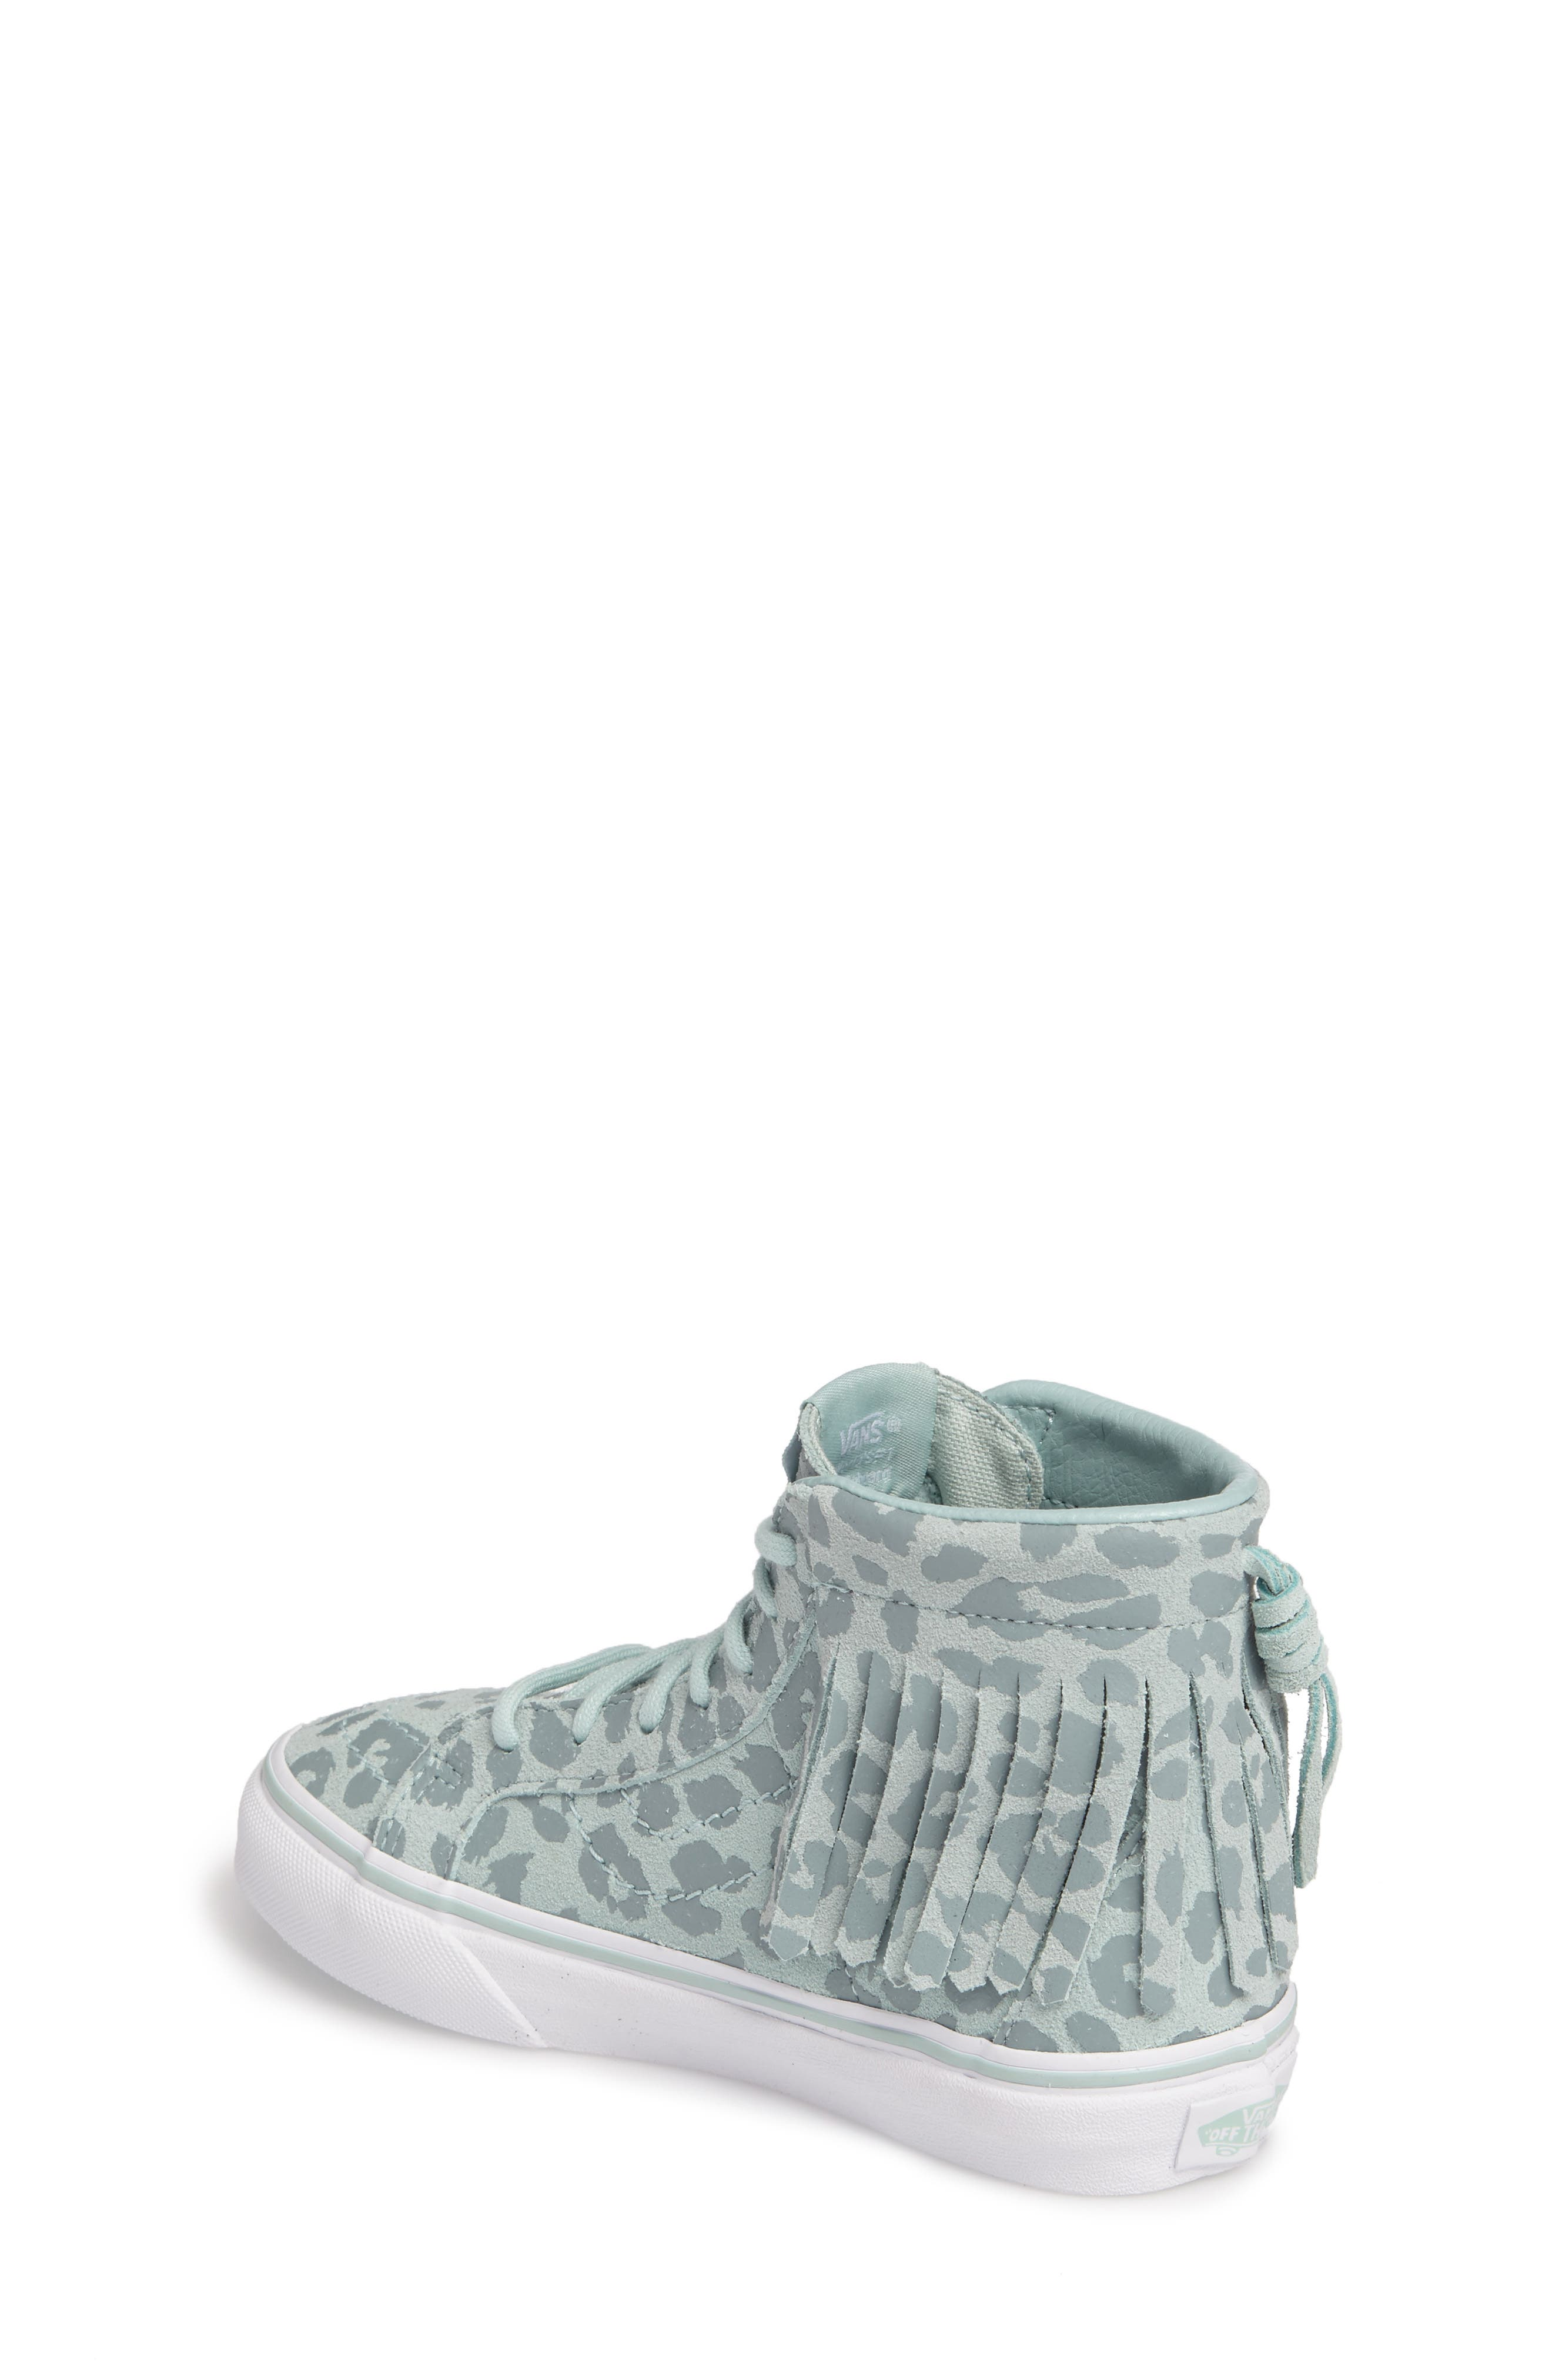 Chukka V Moc Sneaker,                             Alternate thumbnail 2, color,                             Harbor Gray Leopard Suede